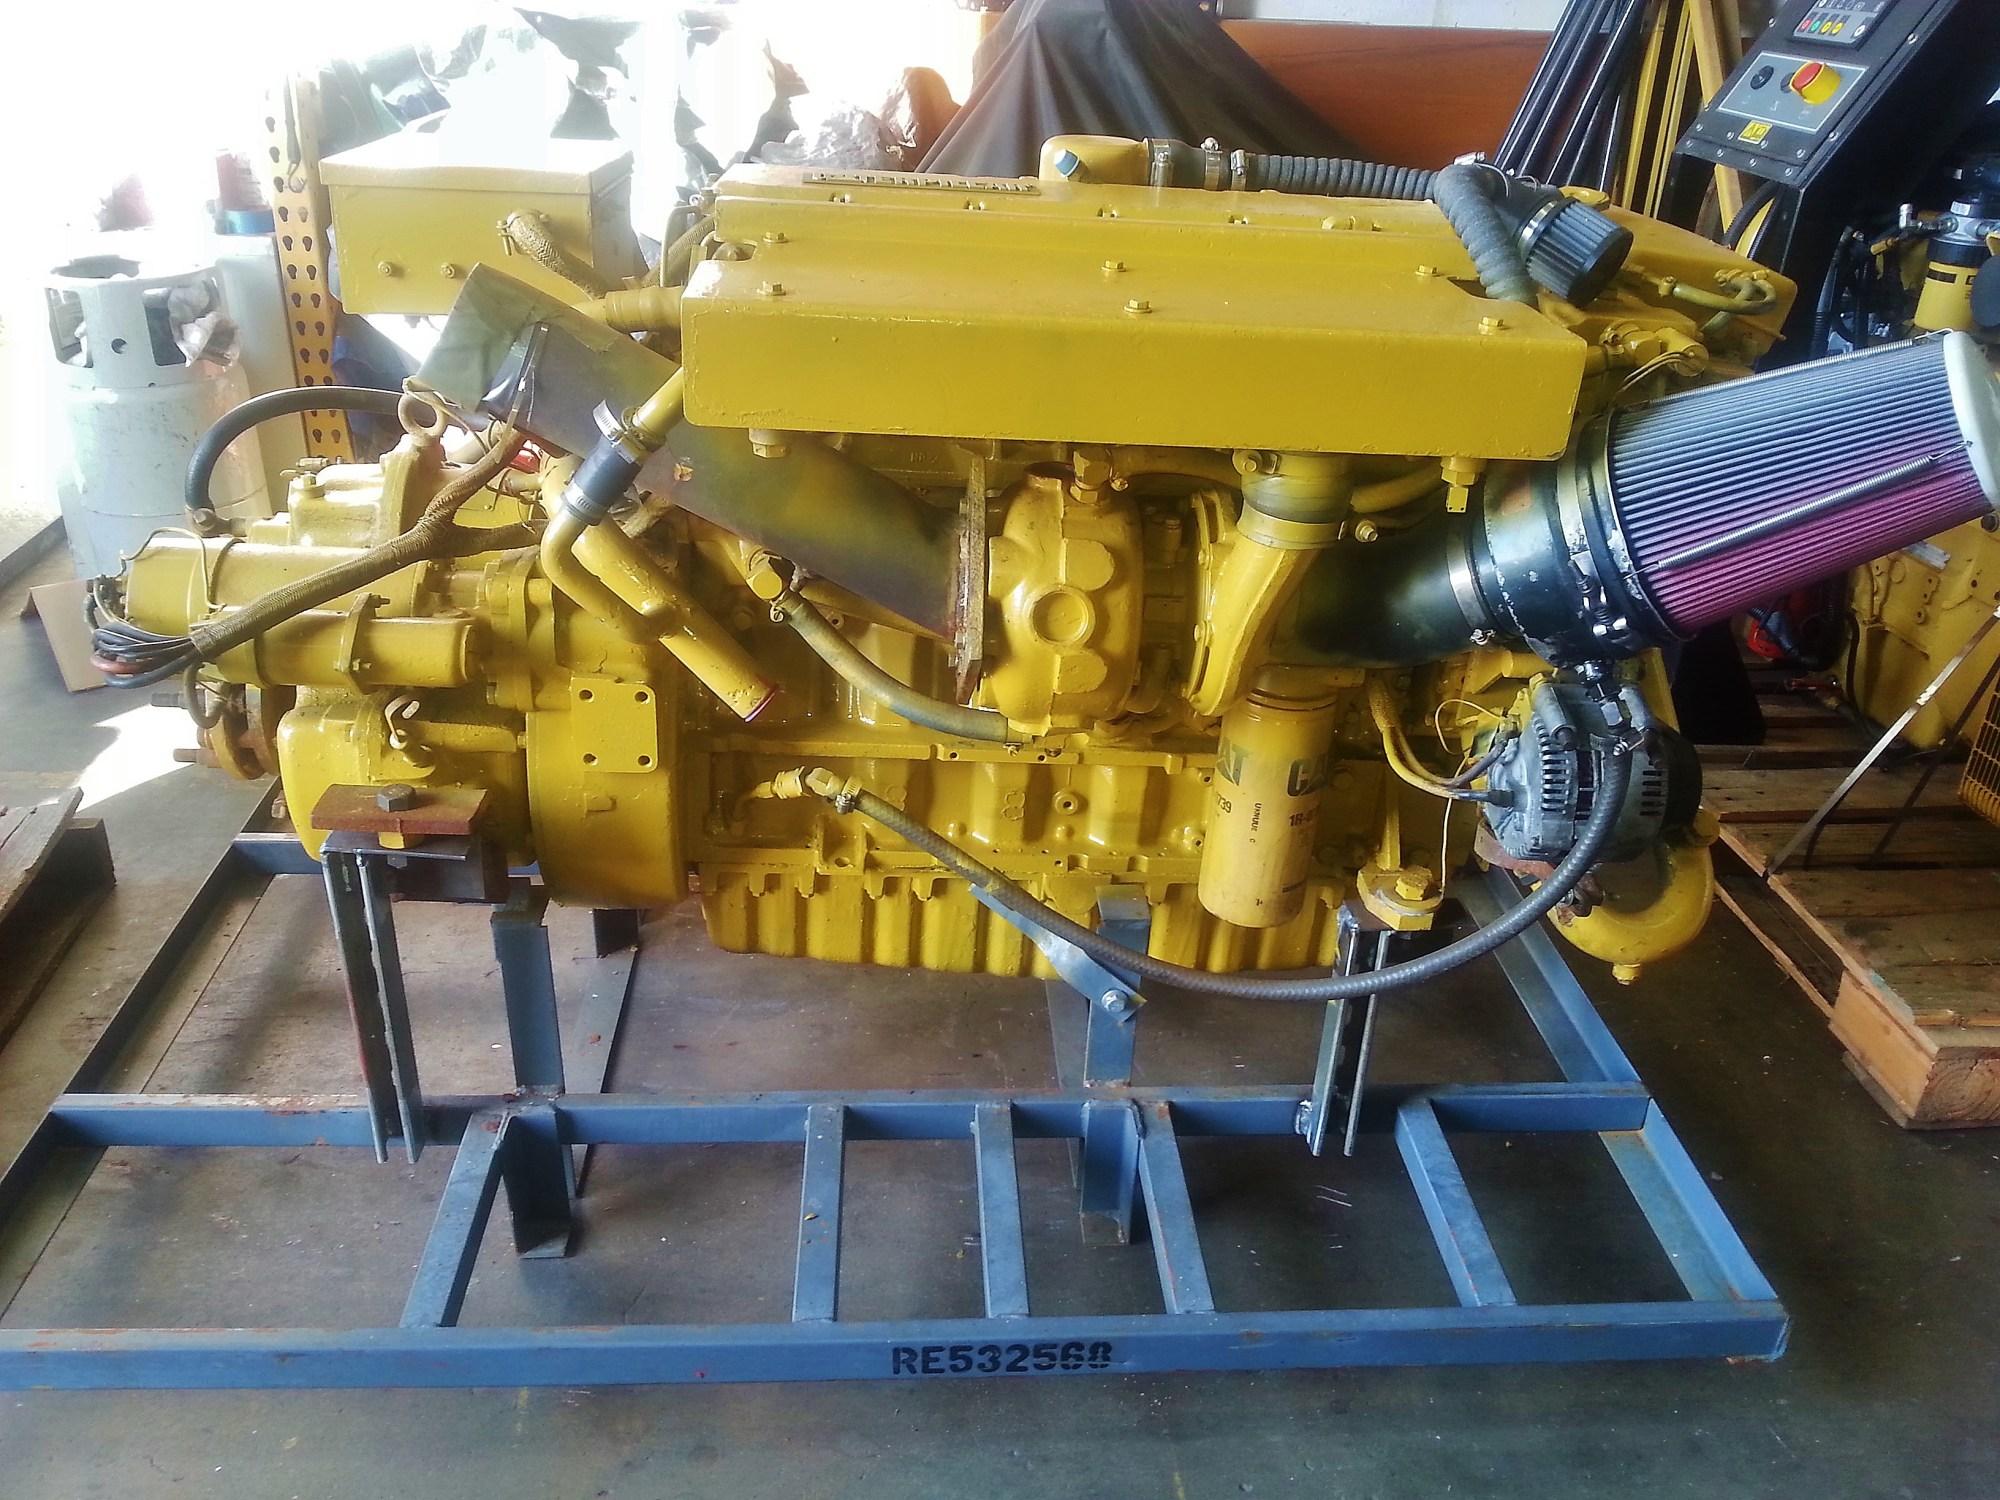 hight resolution of  c0329d manual de motor caterpillar 3126